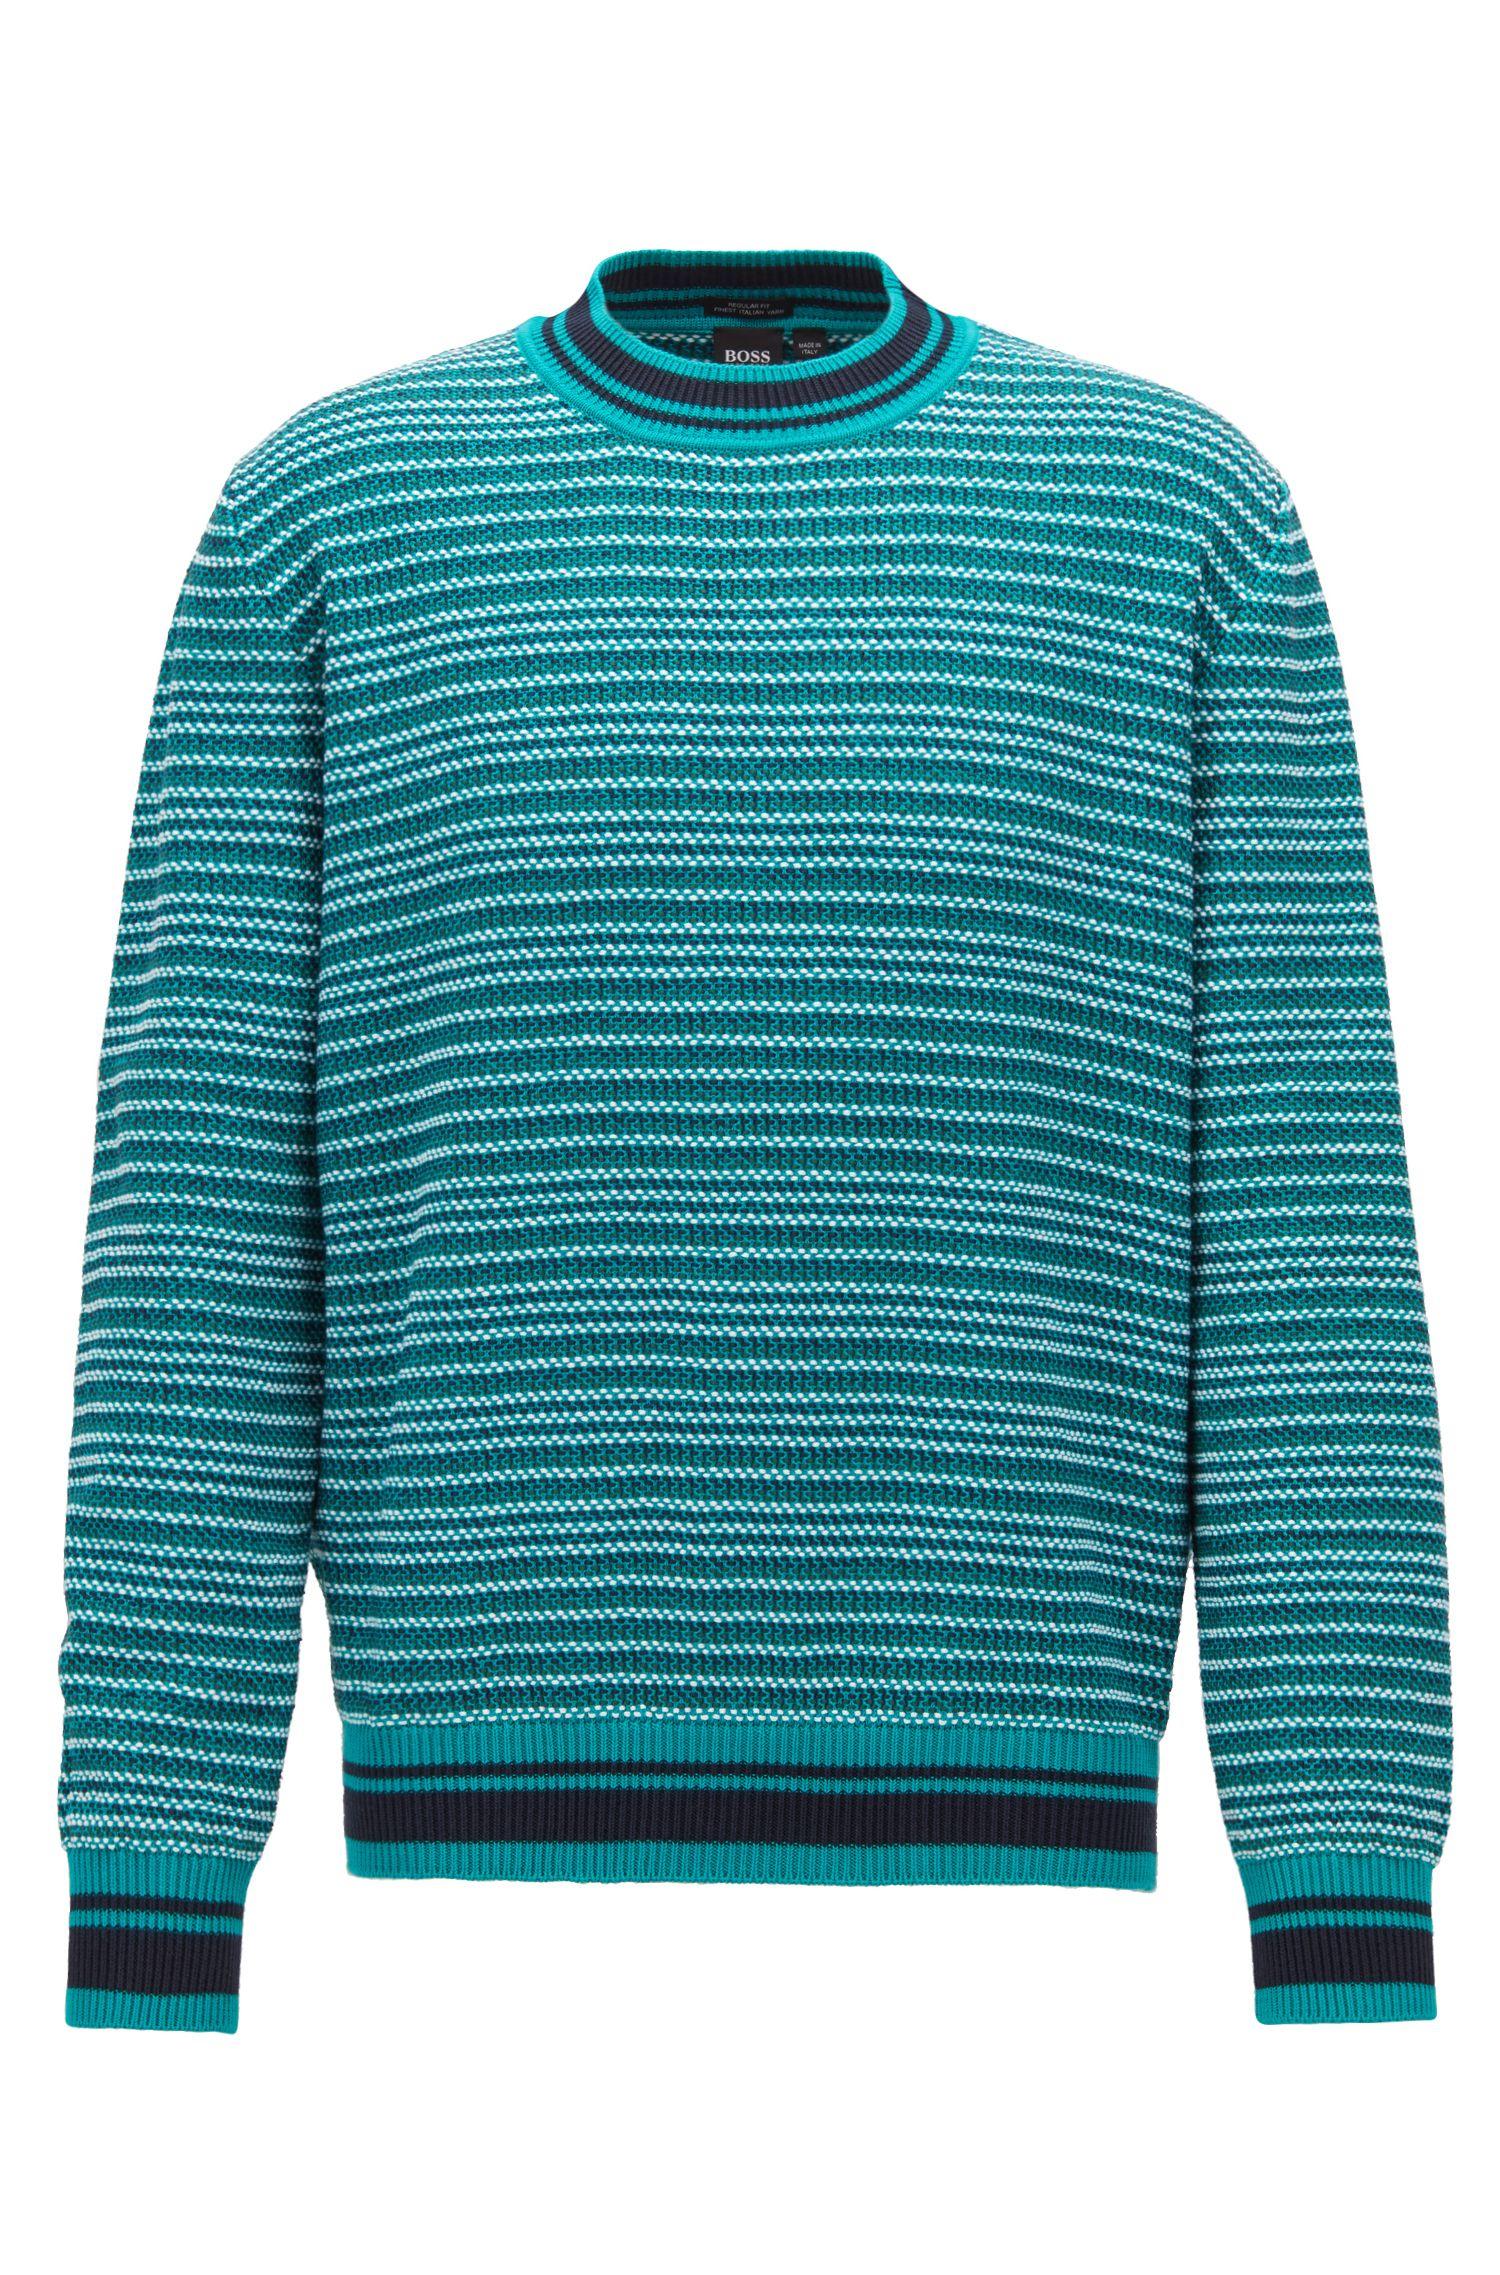 Multi-textured striped sweater in cotton jacquard, Green